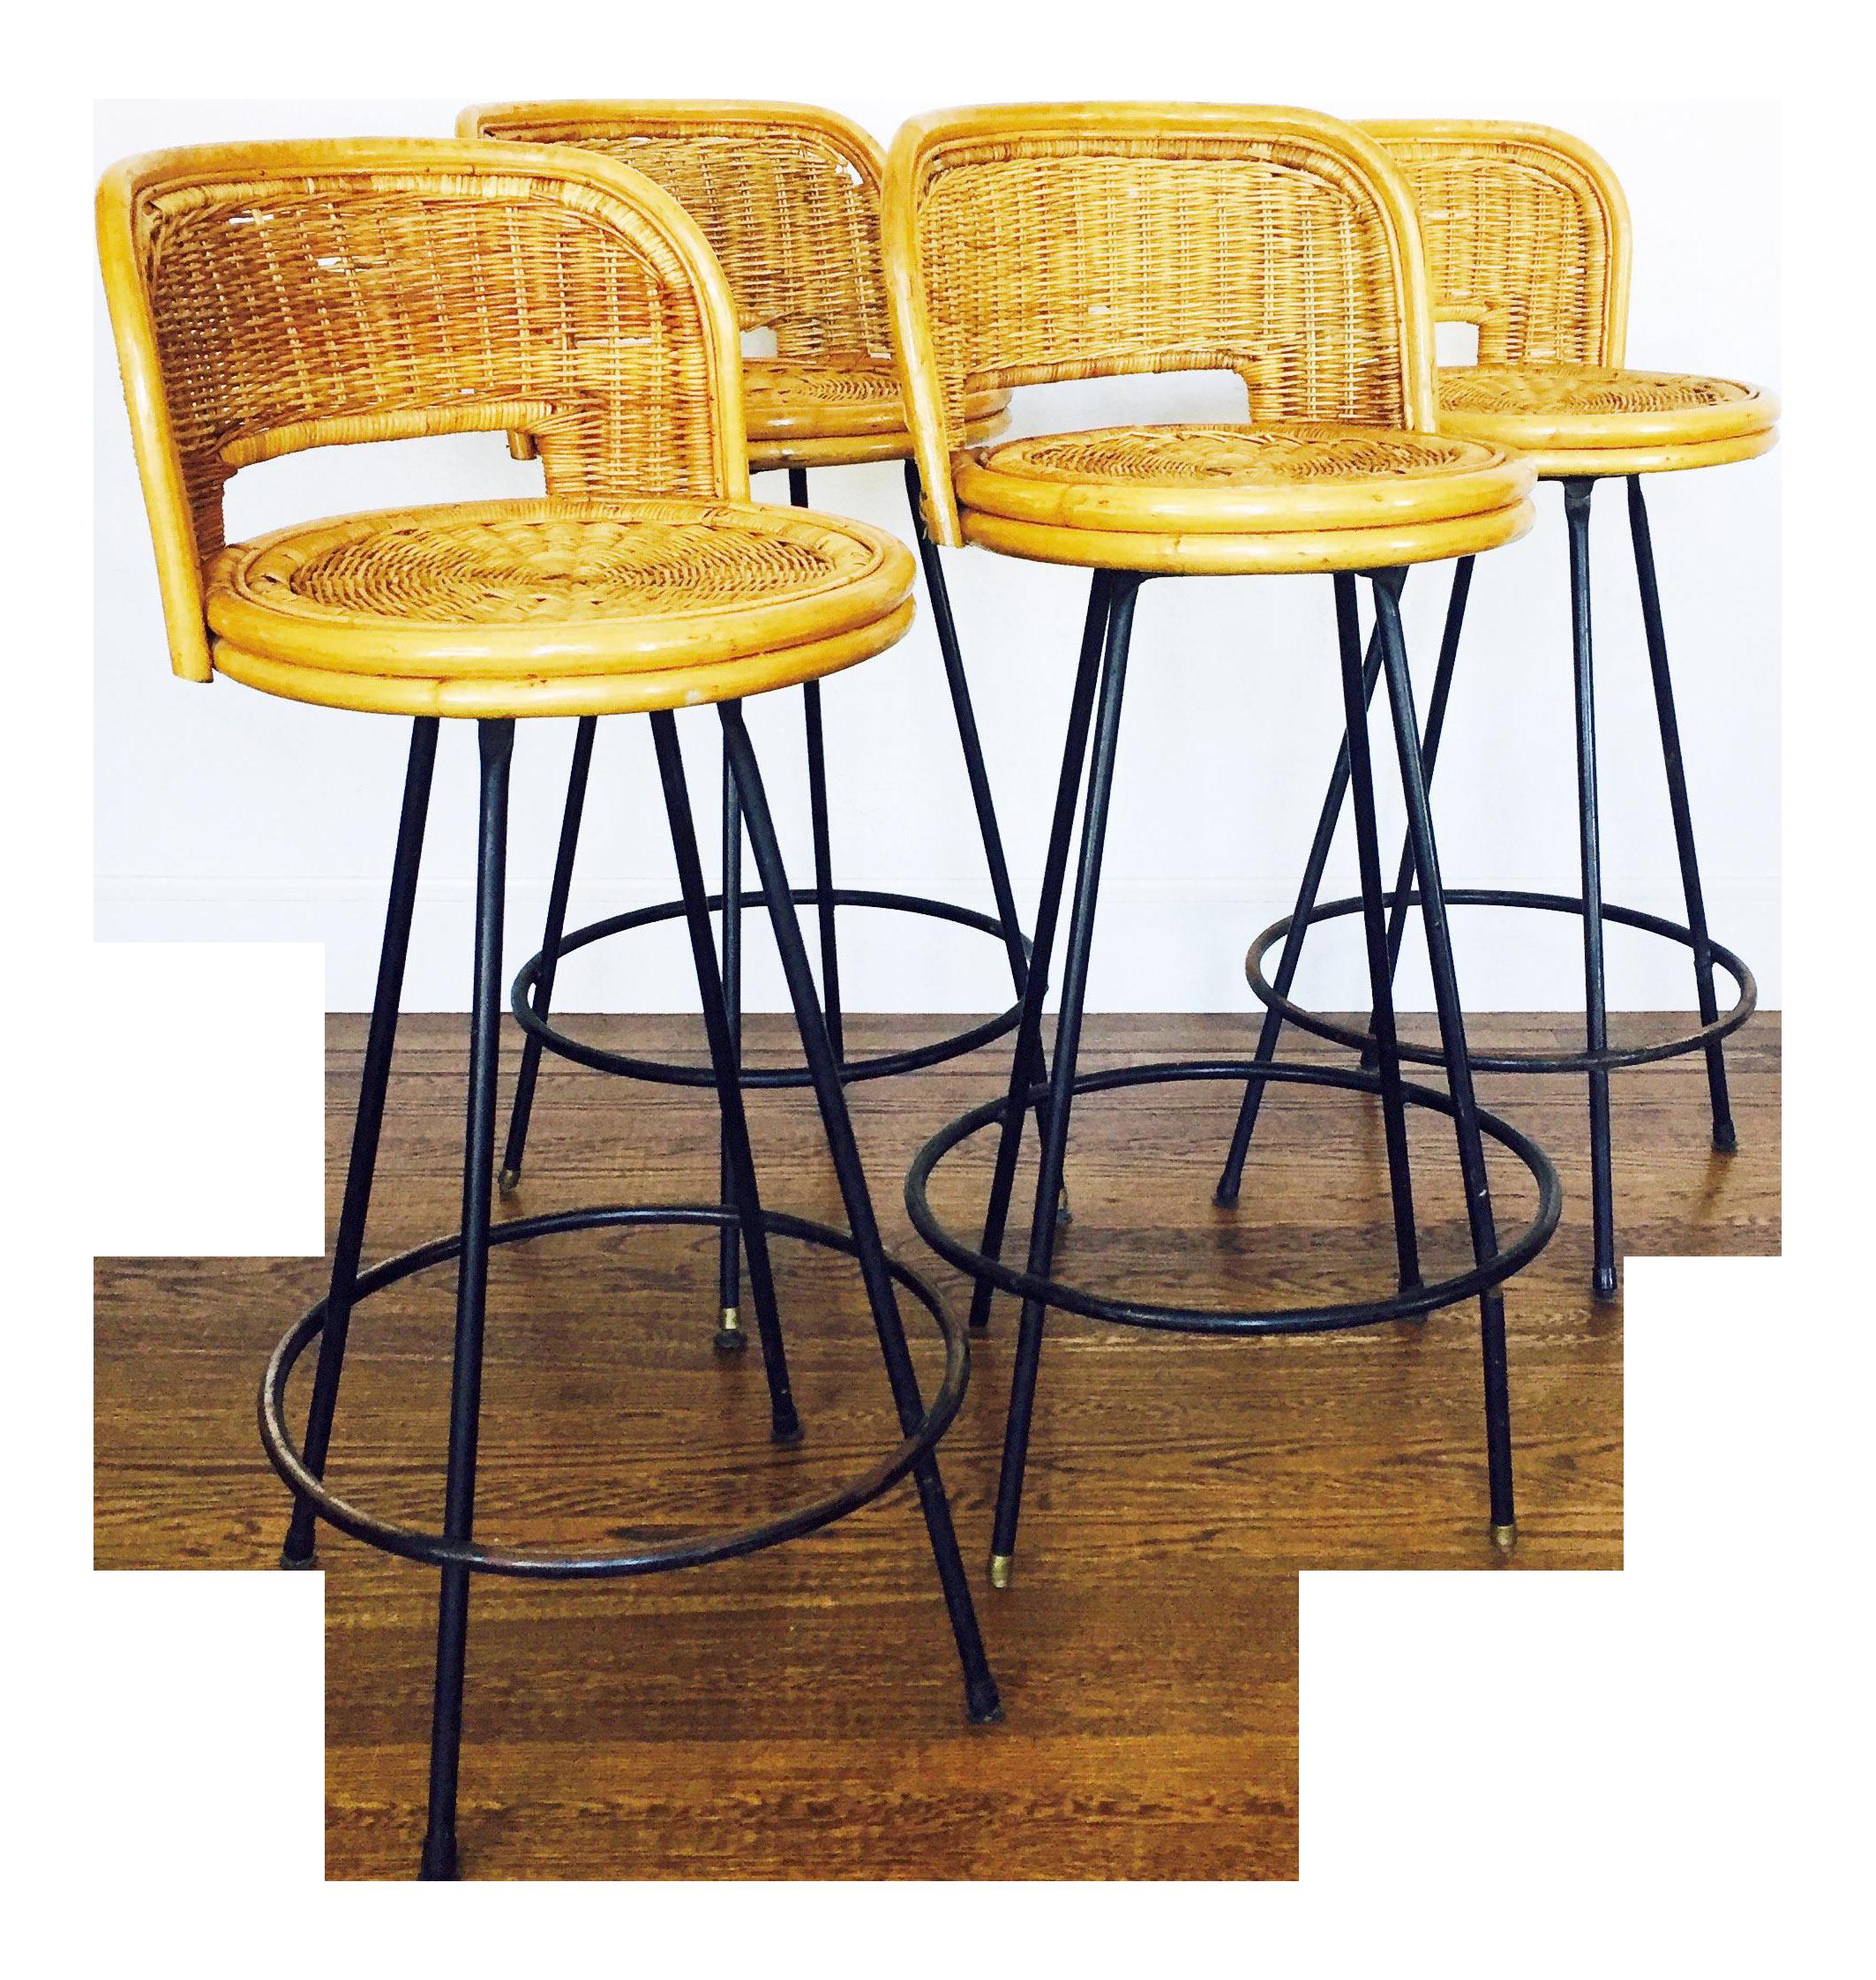 Vintage Rattan & Wrought Iron Bar Stools Set of 4